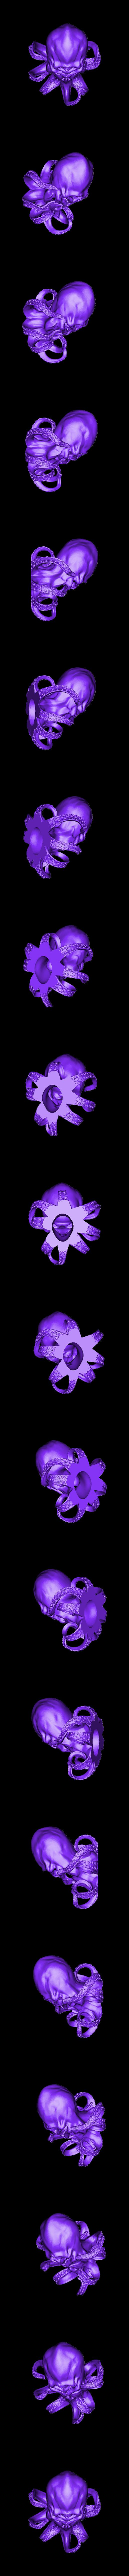 Cthulhu skull hollow tea light.stl Download free STL file Cthulhu Skull • 3D printable design, LittleTup